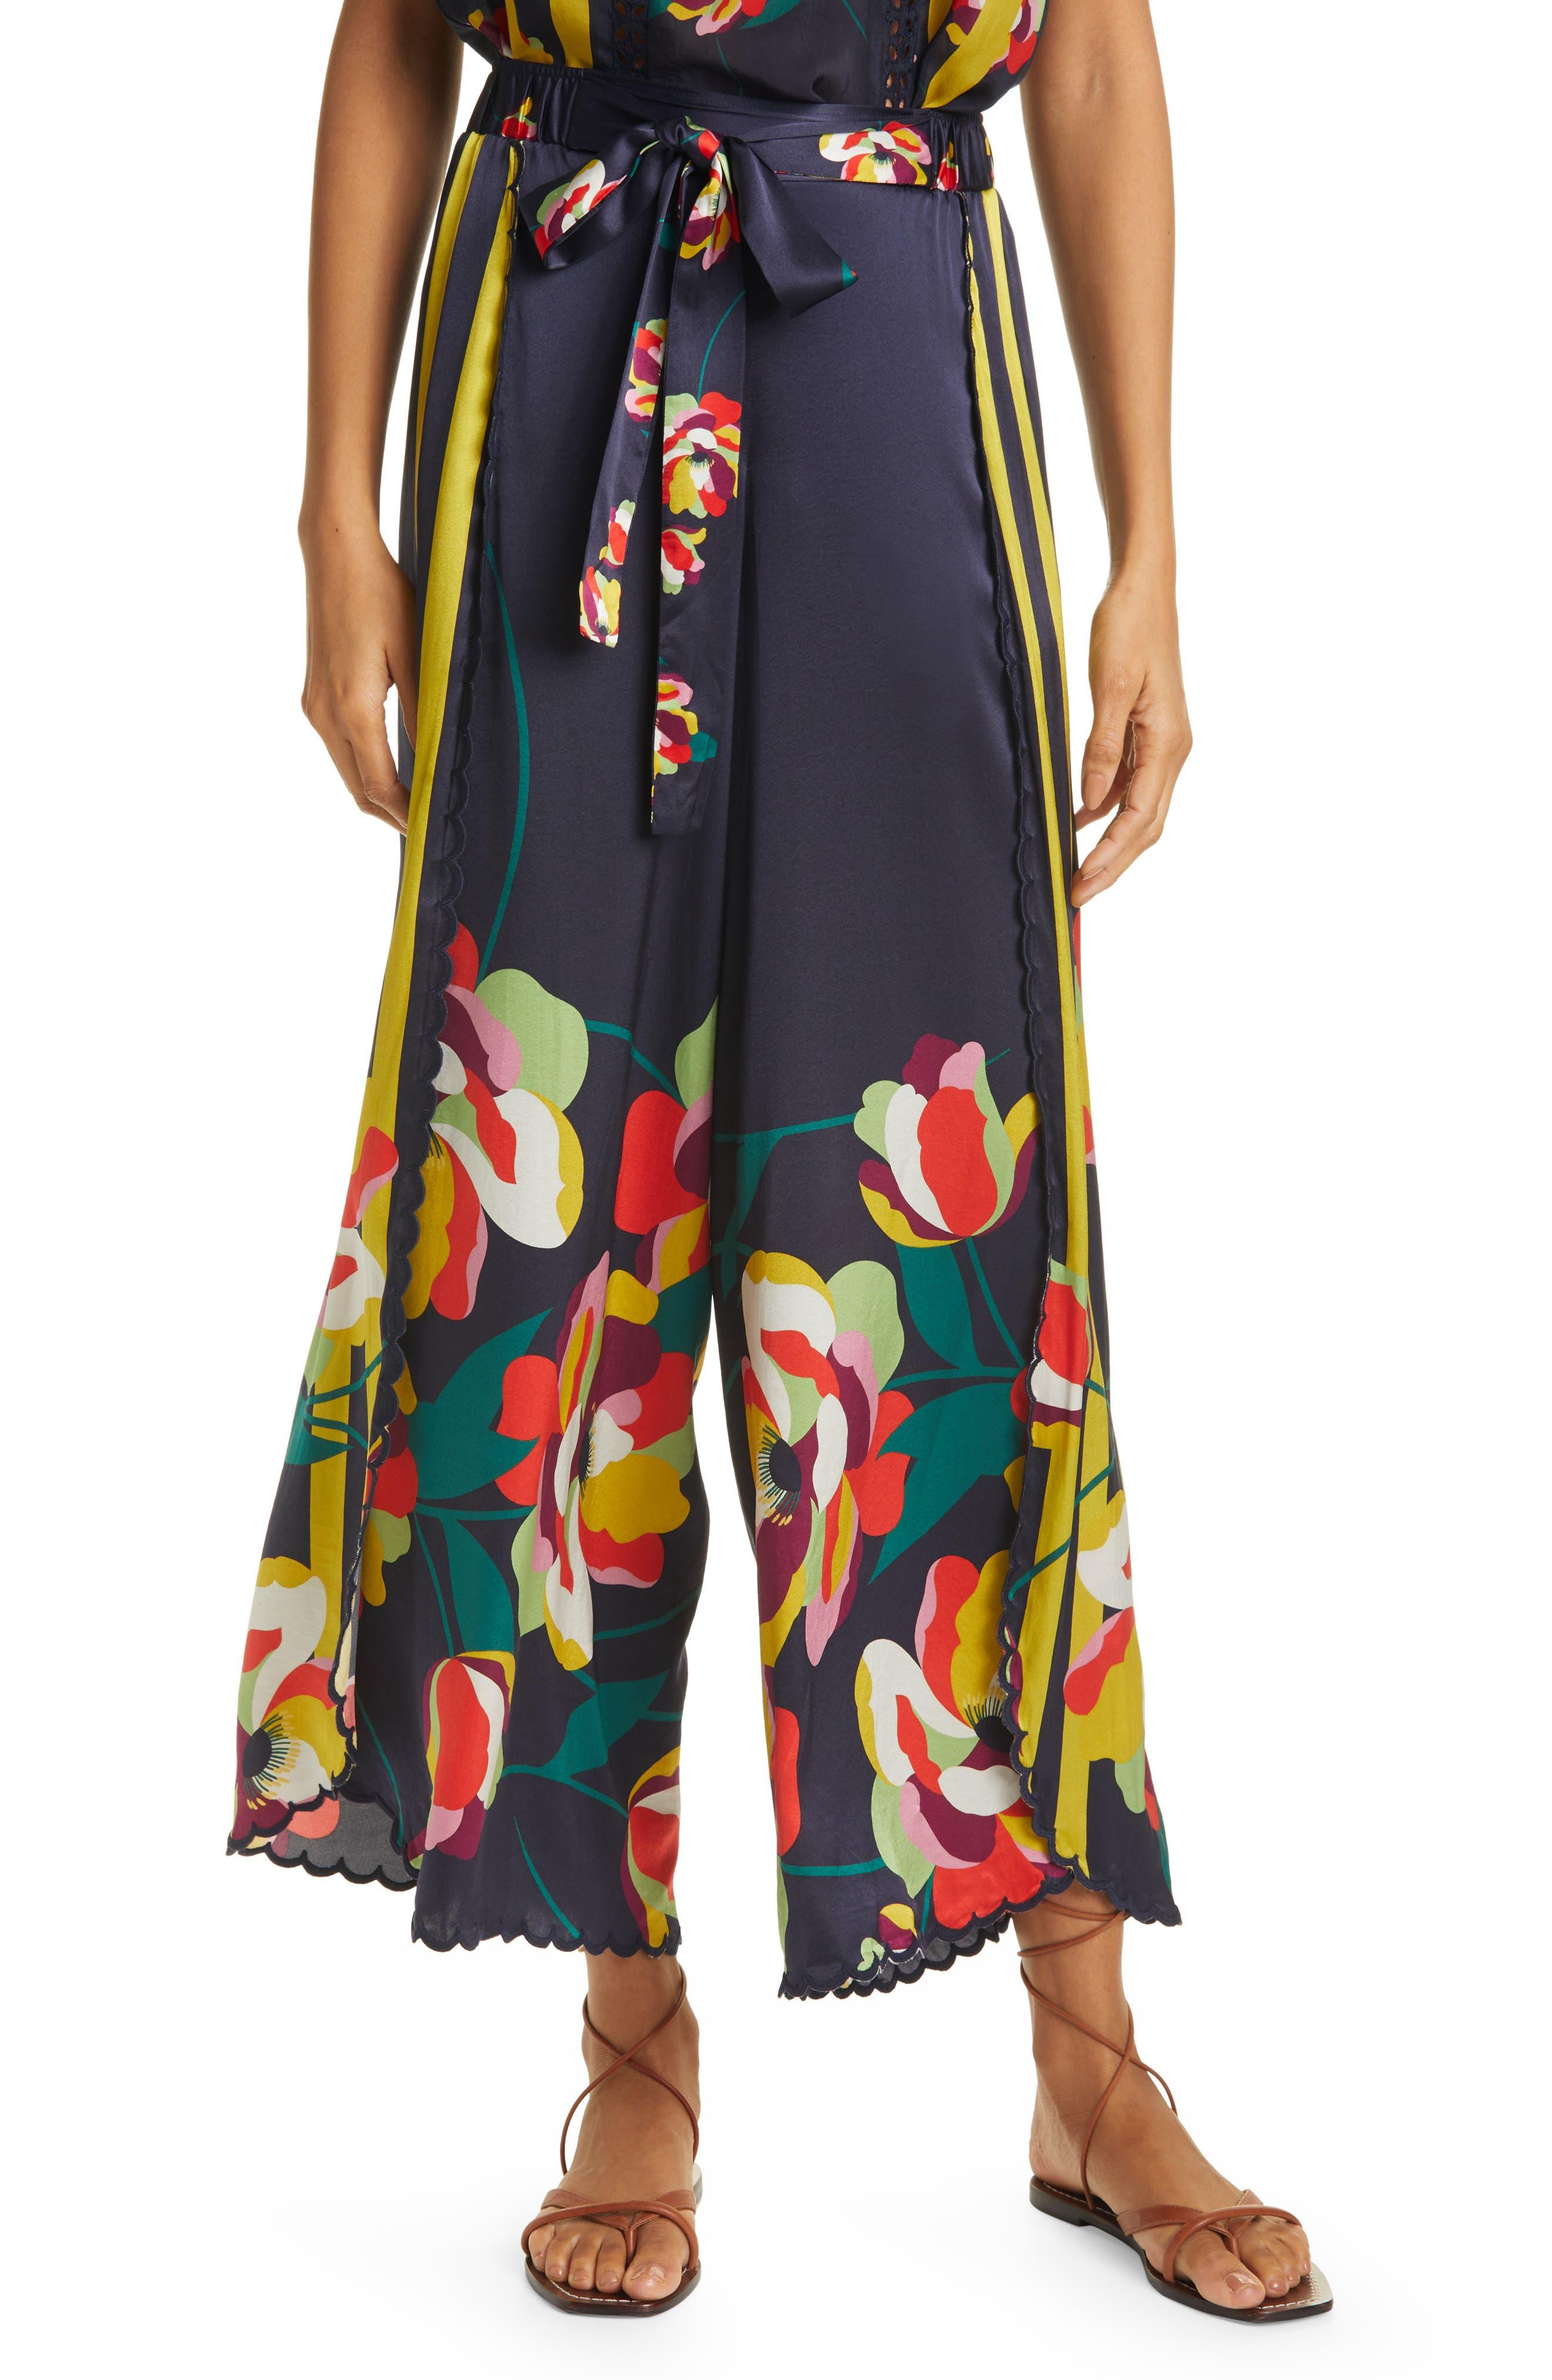 1930s Wide Leg Pants and Beach Pajamas Womens Johnny Was Cassandra Floral Crop Wide Leg Drawstring Pants Size Large - Blue $285.00 AT vintagedancer.com